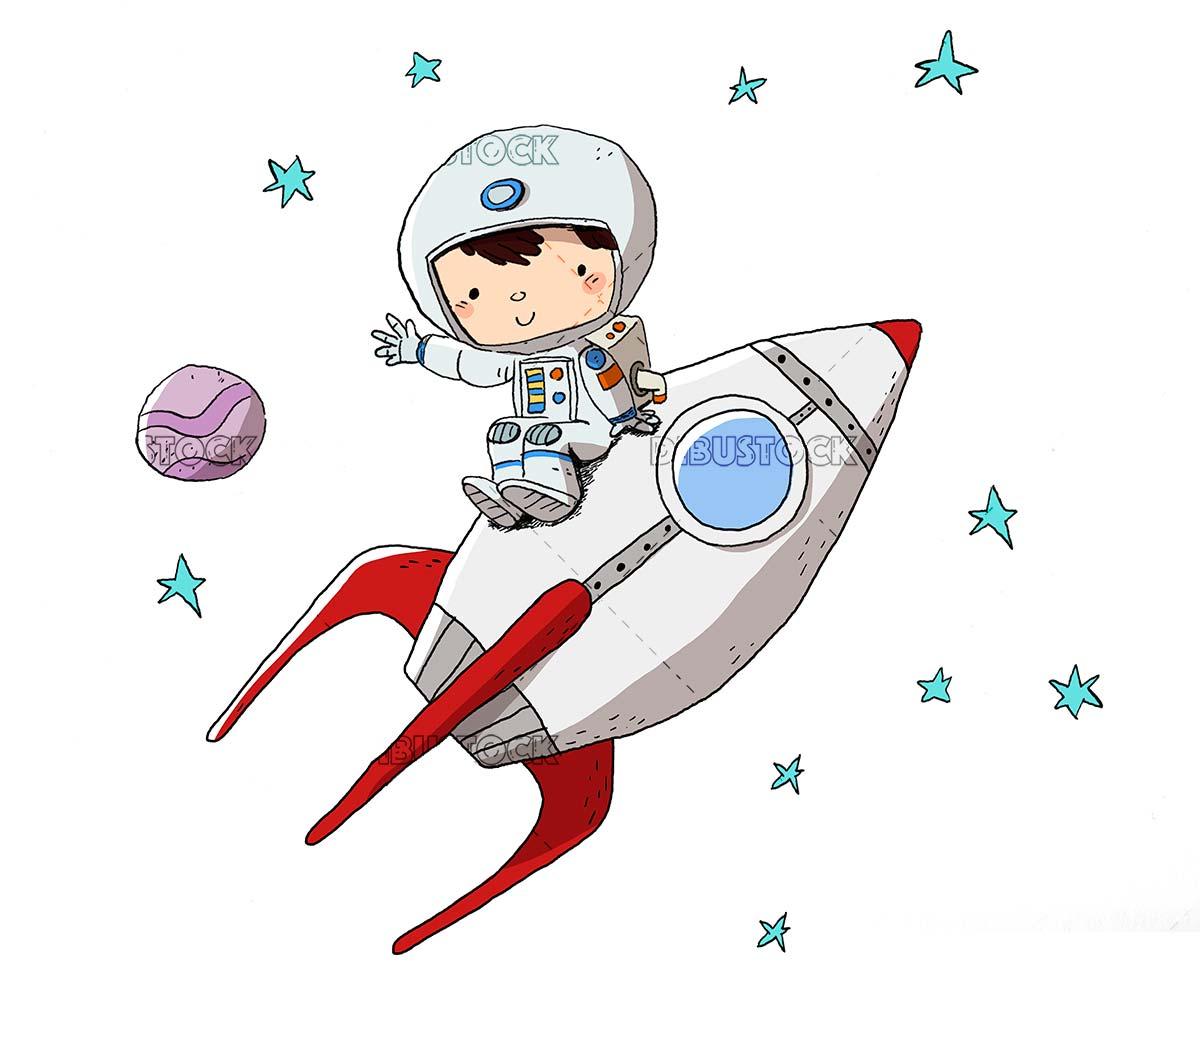 Astronaut in a rocket. Sitting on a rocket